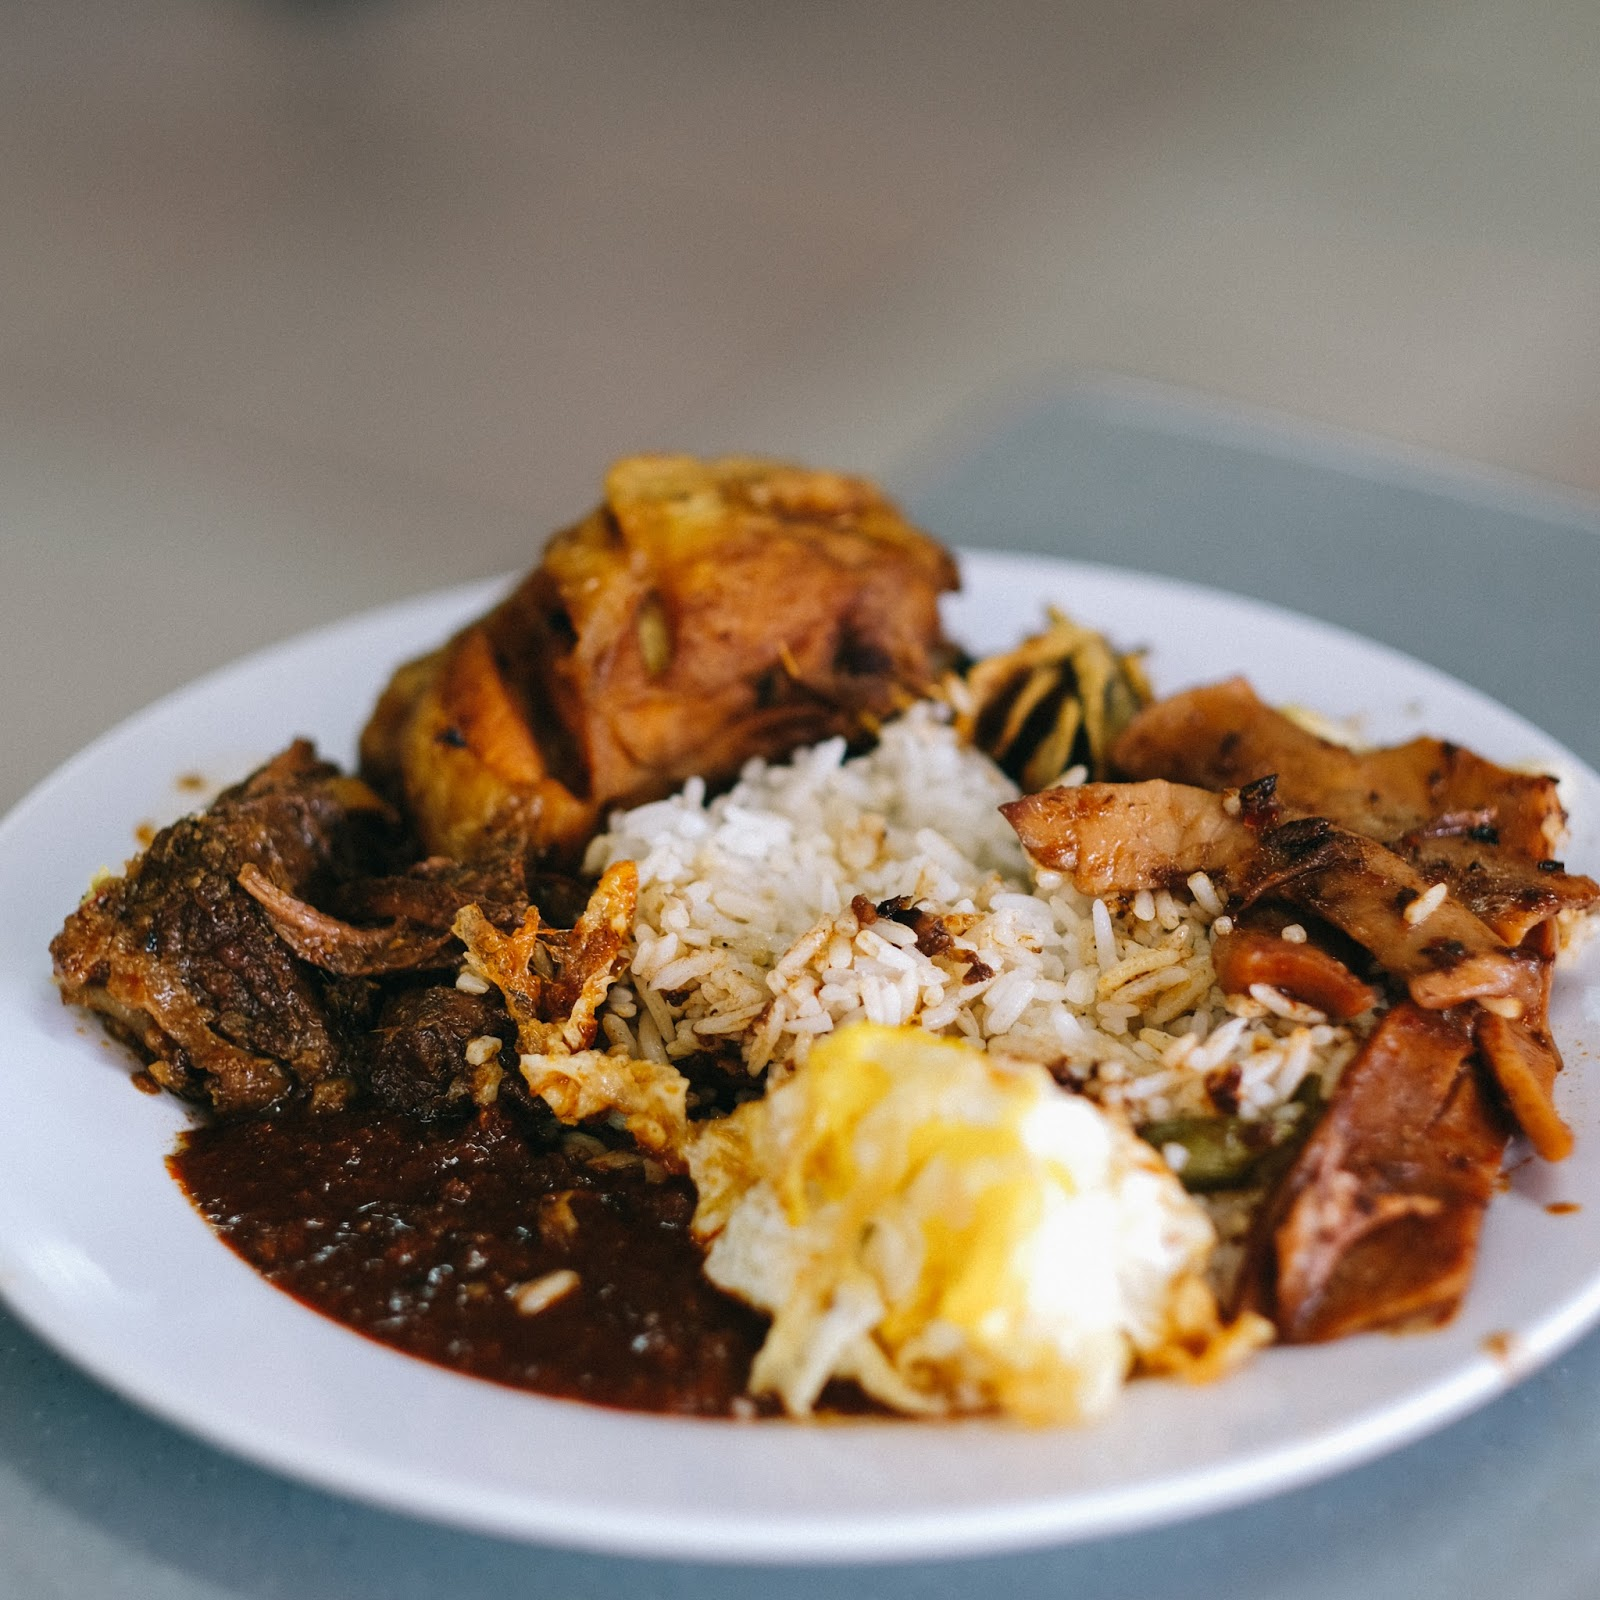 NASI LEMAK TANGLIN - THE BEST NASI LEMAK I'VE EVER TRIED - foodandfeast